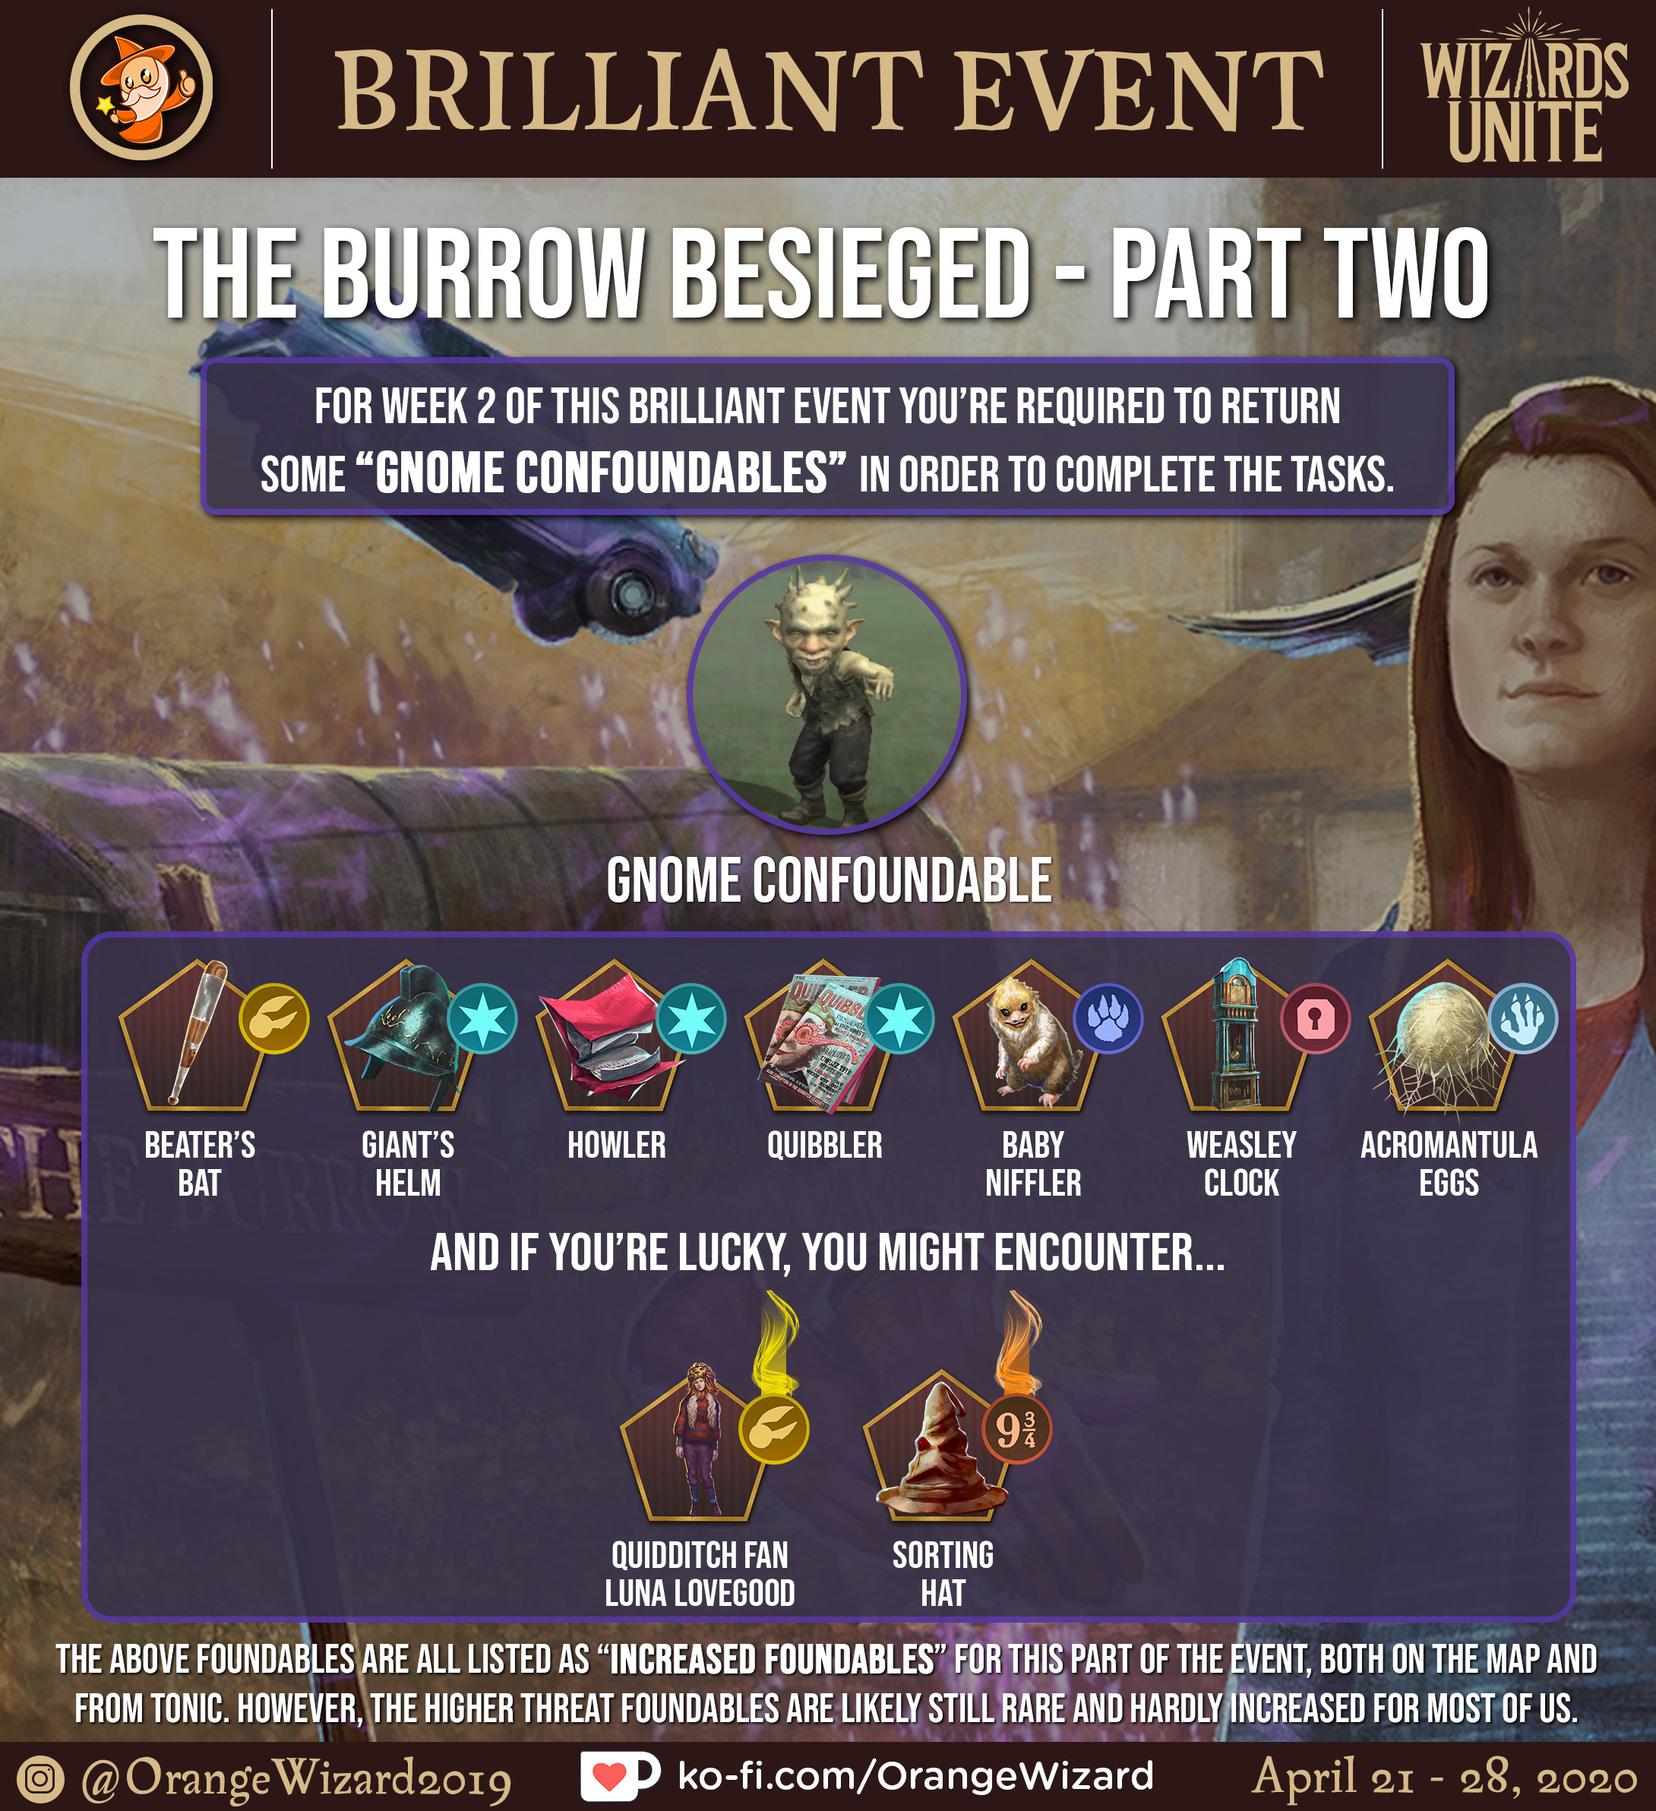 BRILLIANT_EVENT_-_BURROW_BESIEGED_II_-_GNOME_CONFOUNDABLES-1.jpg